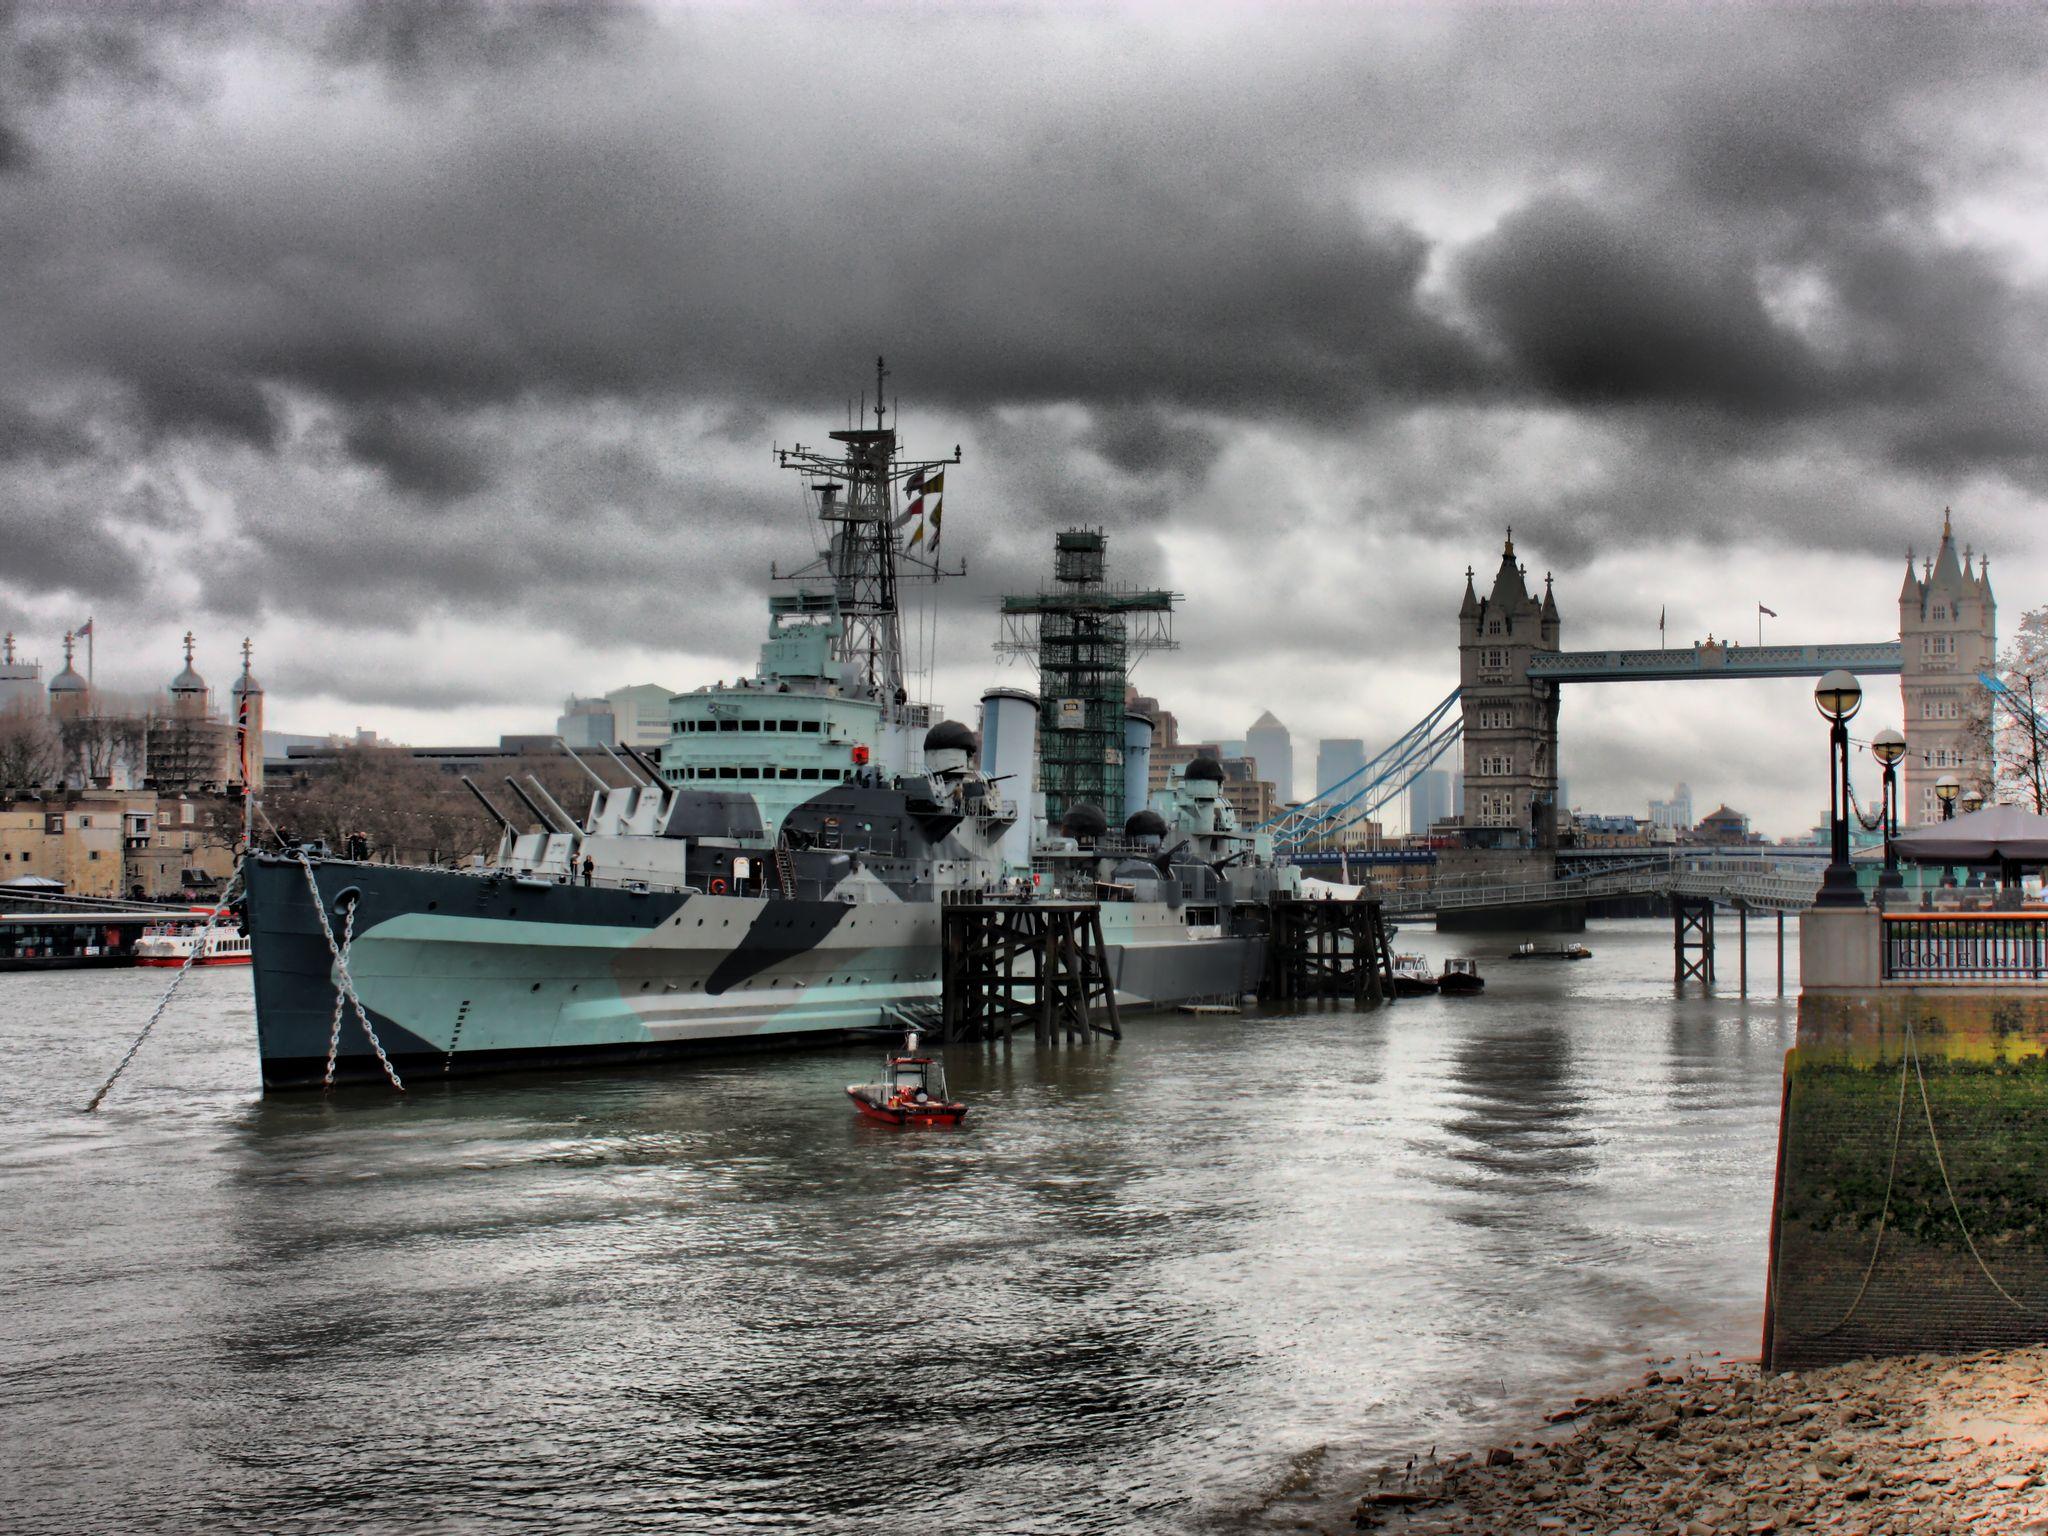 Download HQ military fantasy Naval Vessels wallpaper / 2048x1536